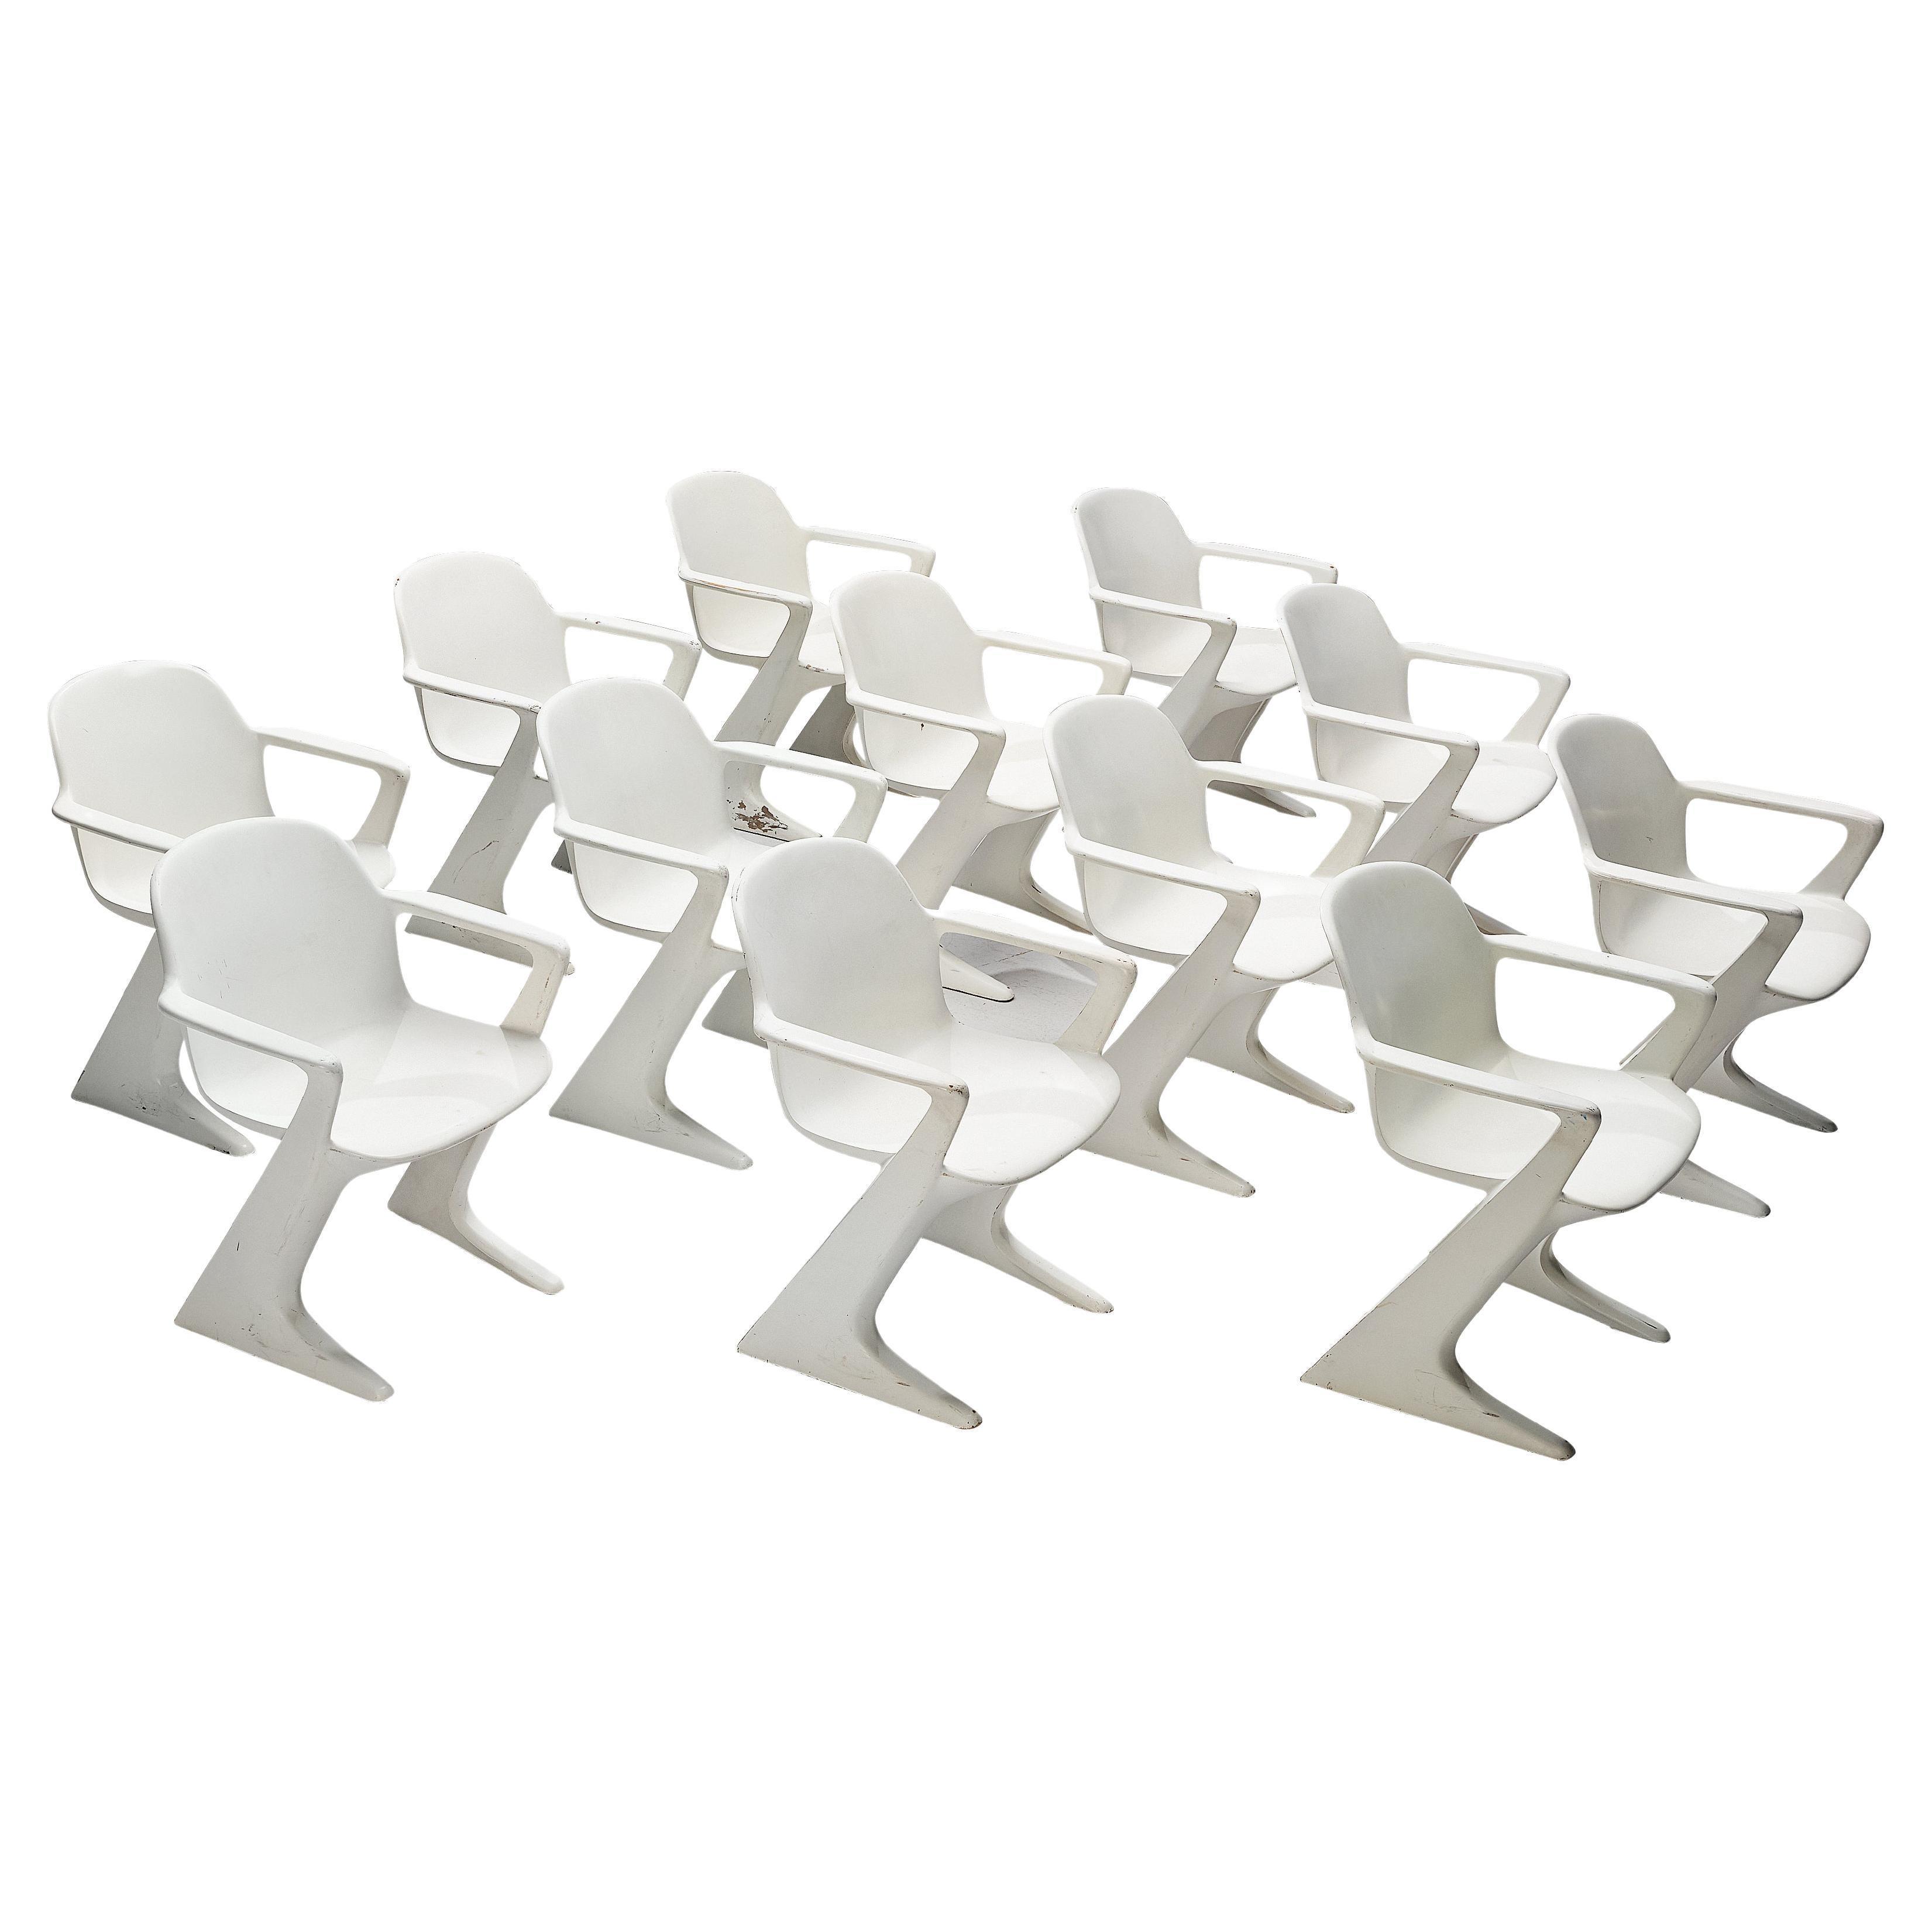 Ernst Moeckl White 'Kangaroo' Dining Chairs